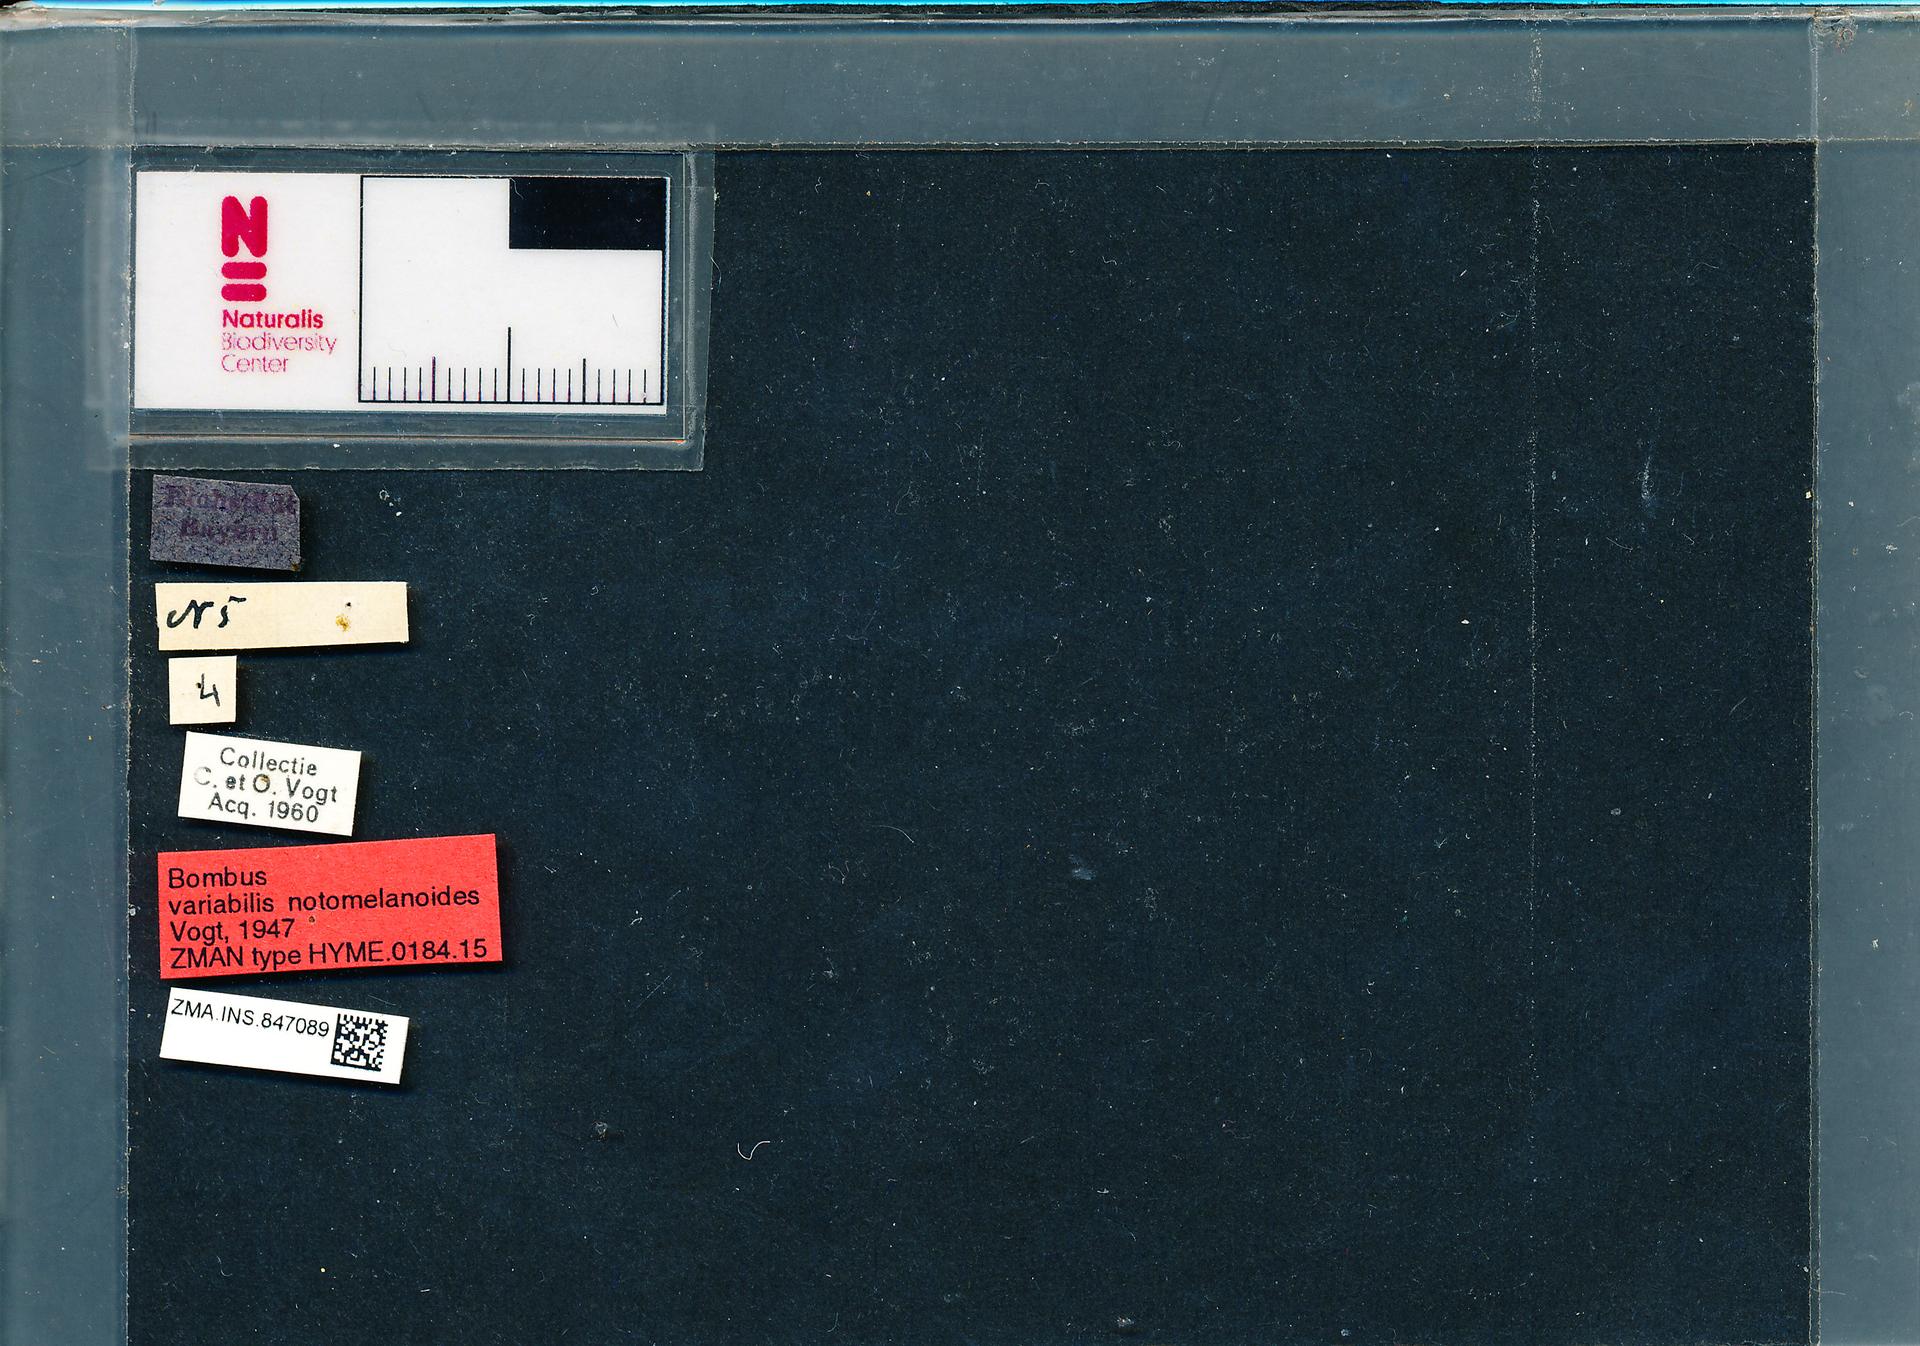 ZMA.INS.847089 | Bombus (Thoracobombus) humilis humilis s.s. Vogt, 1947